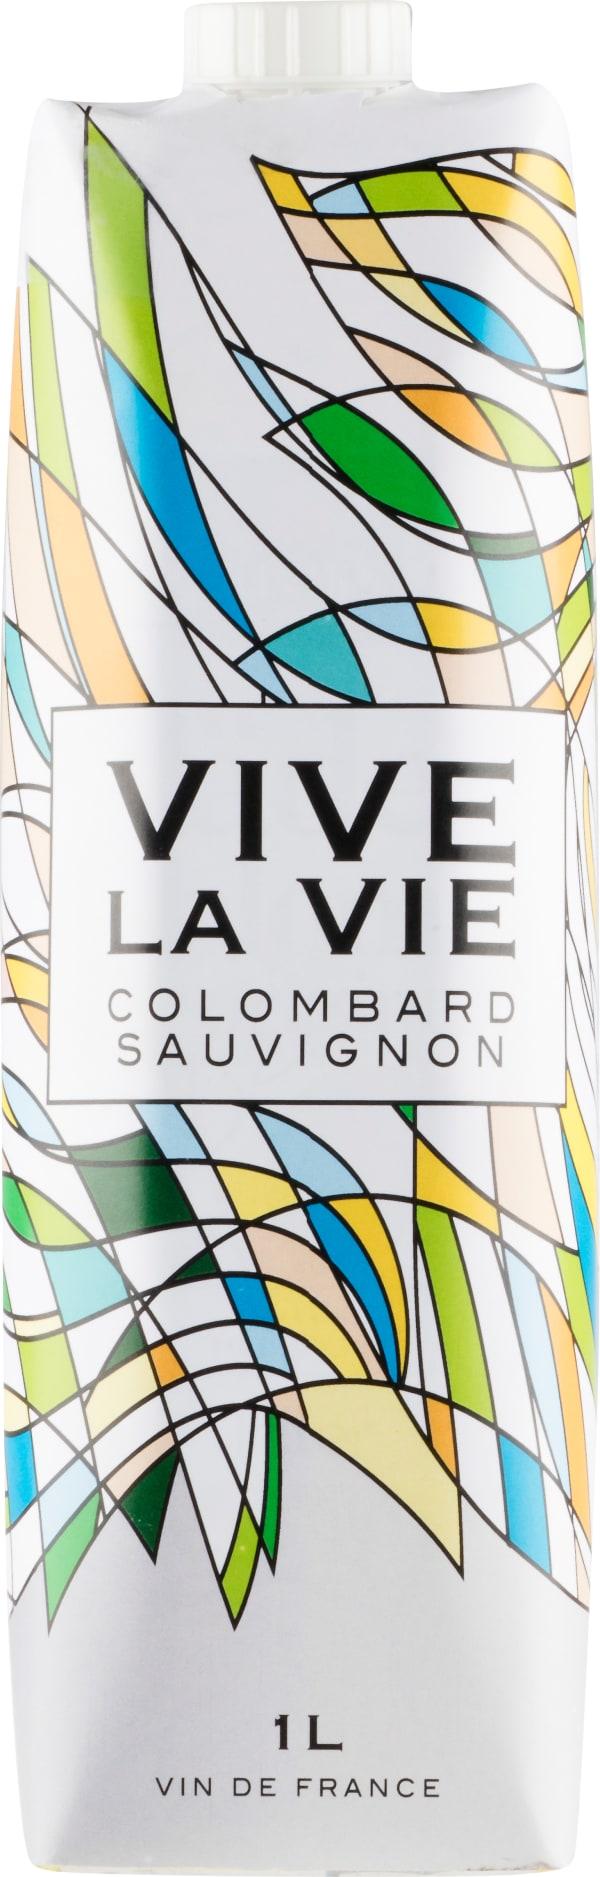 Vive la Vie Colombard Sauvignon 2018 kartongförpackning